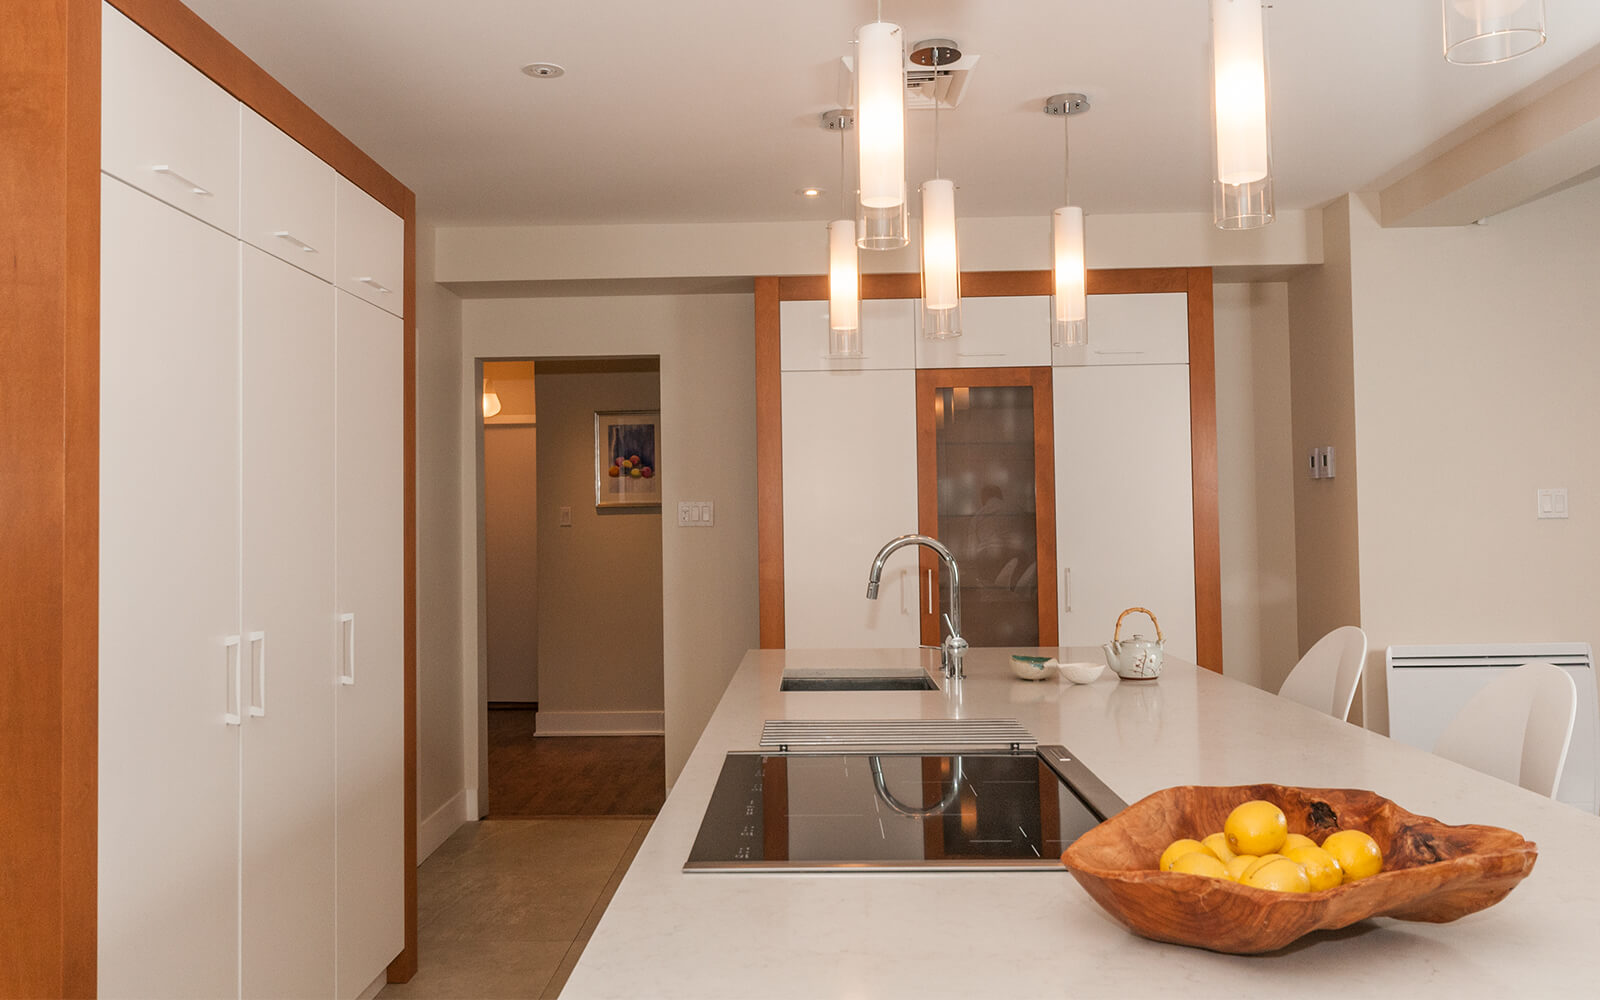 Aménagement rénovation cuisine comptoir